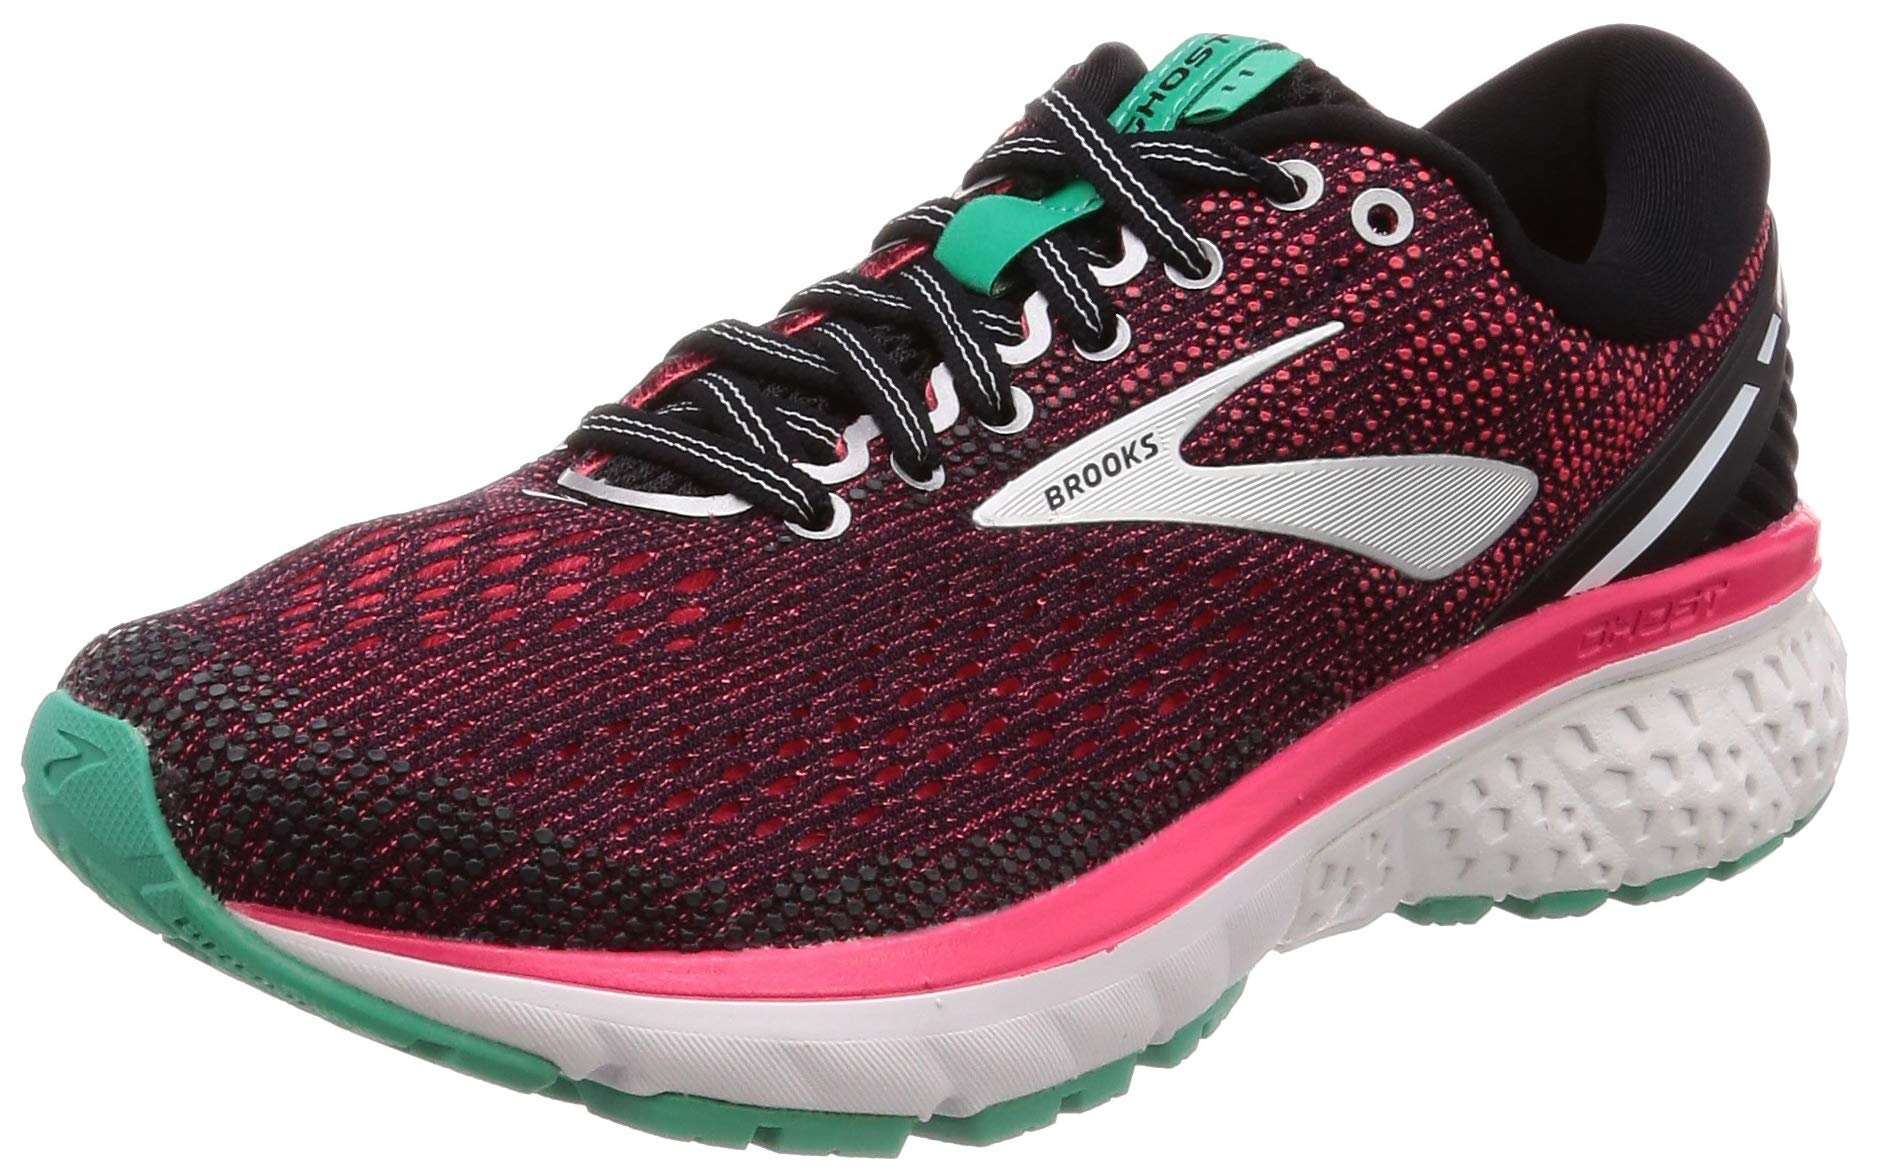 Brooks Womens Ghost 11 Running Shoe - Black/Pink/Aqua - D - 5.0 by Brooks (Image #1)